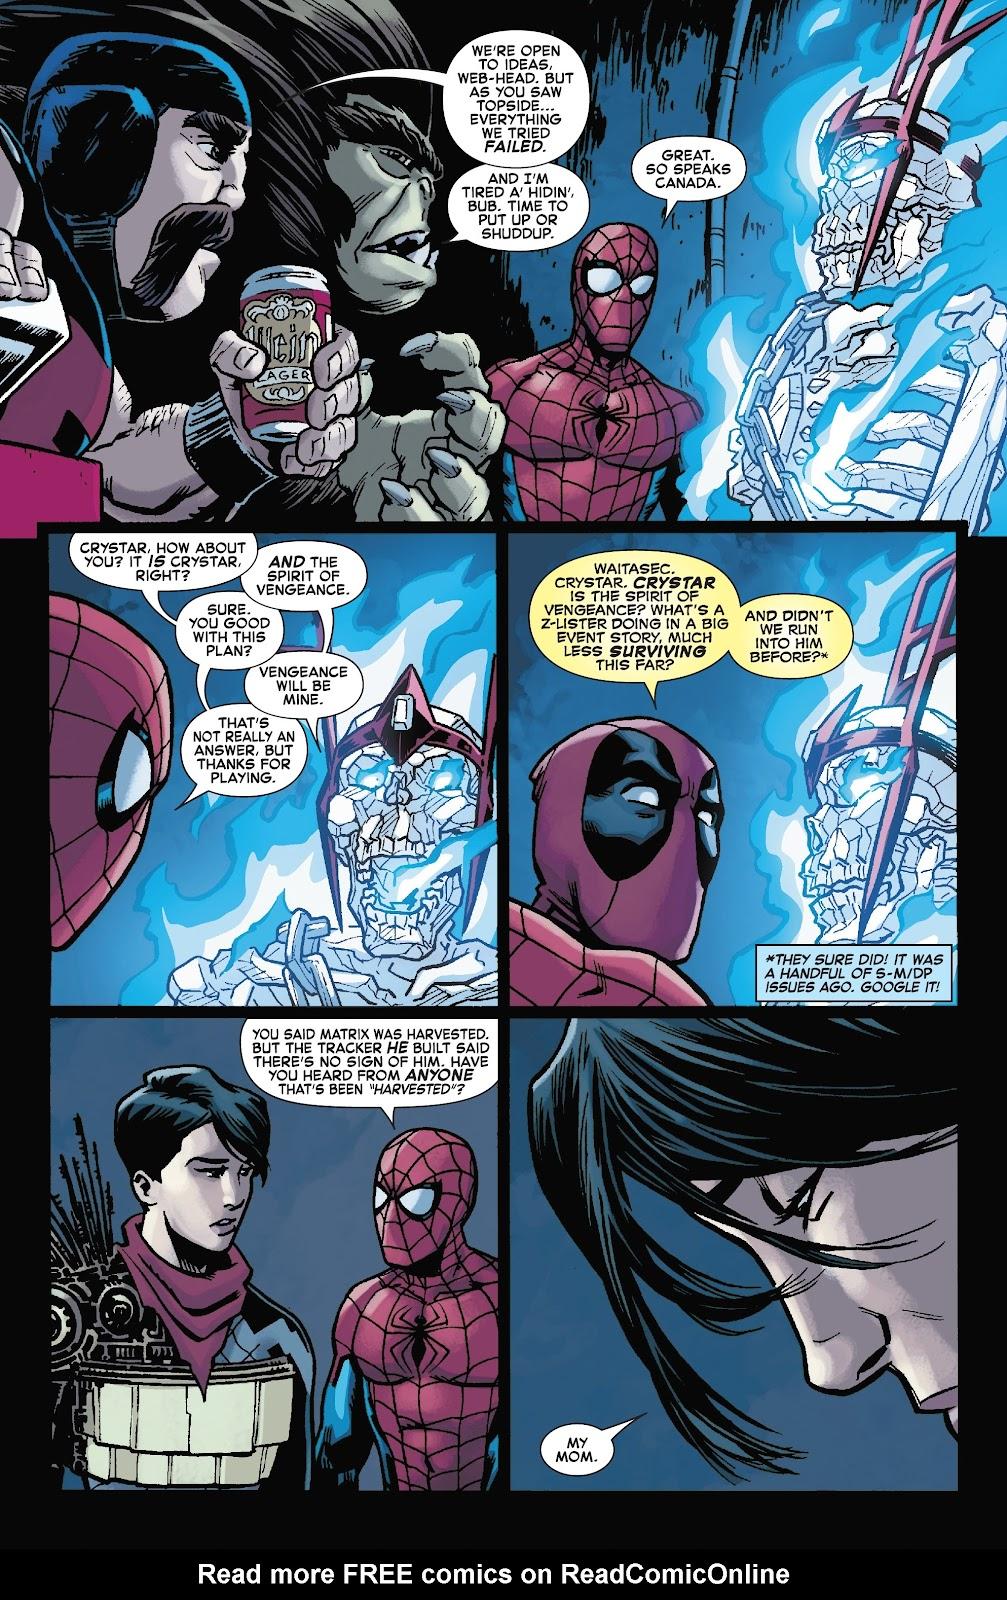 Read online Spider-Man/Deadpool comic -  Issue #47 - 6